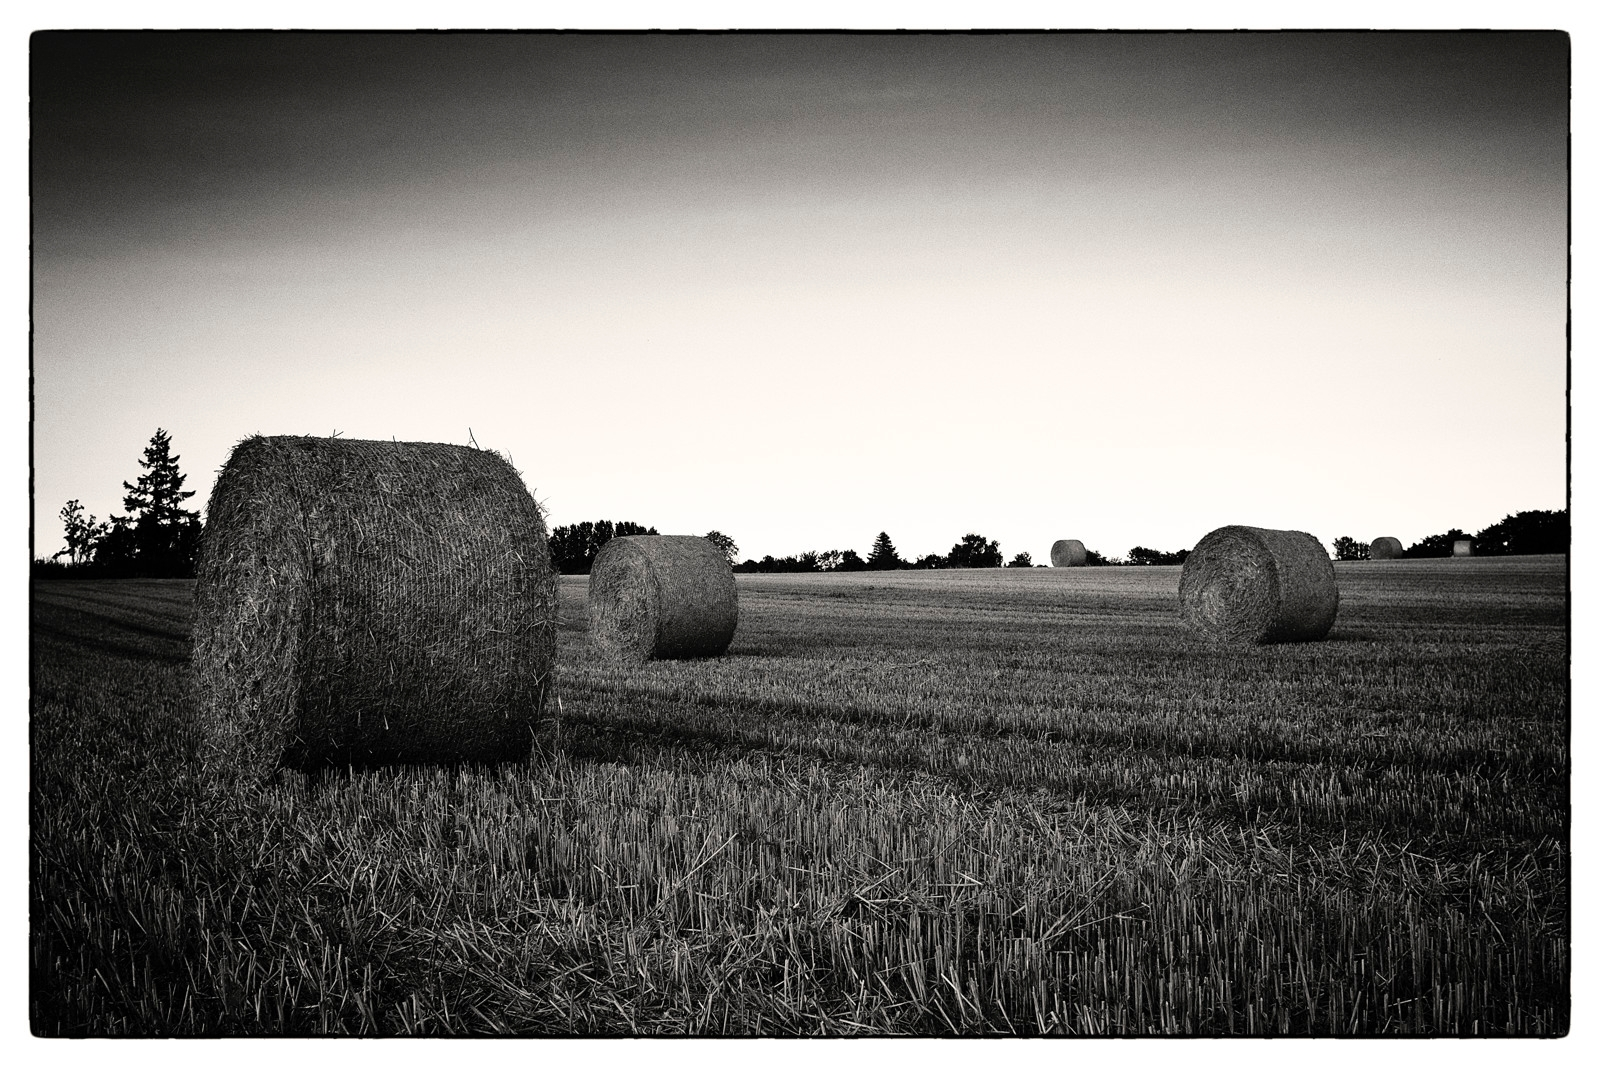 Landscape - PentaxK3II, bw, blackandwhite - sselvejer | ello